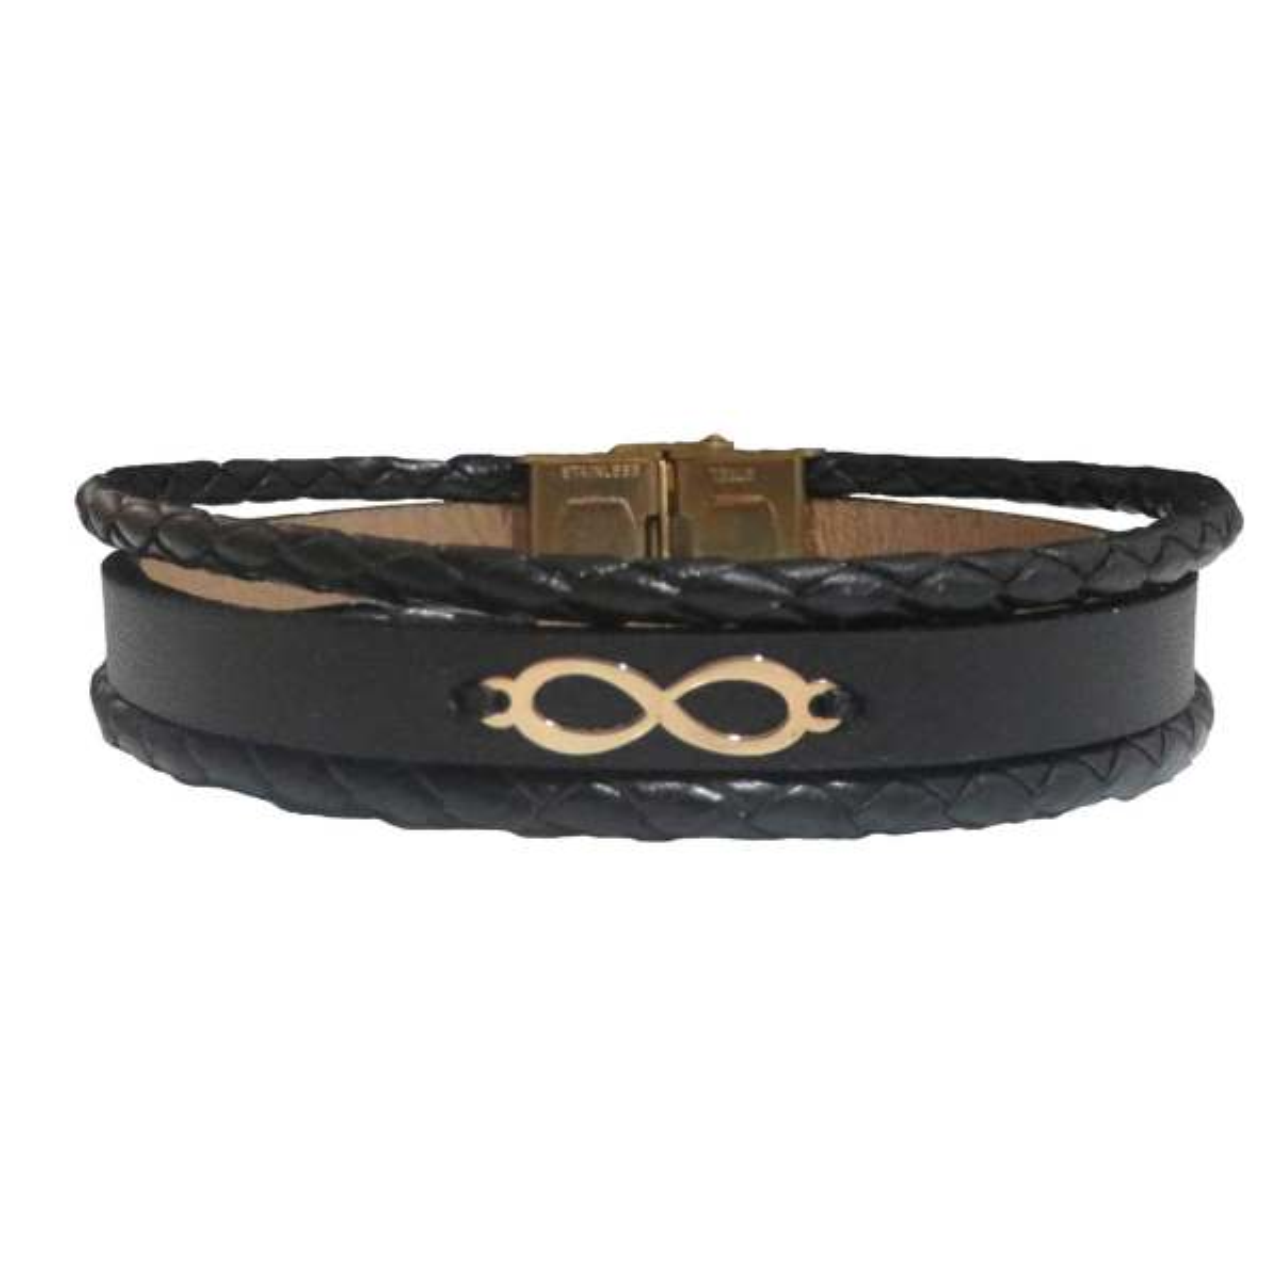 دستبند طلا 18 عیار زنانه کد DCT11